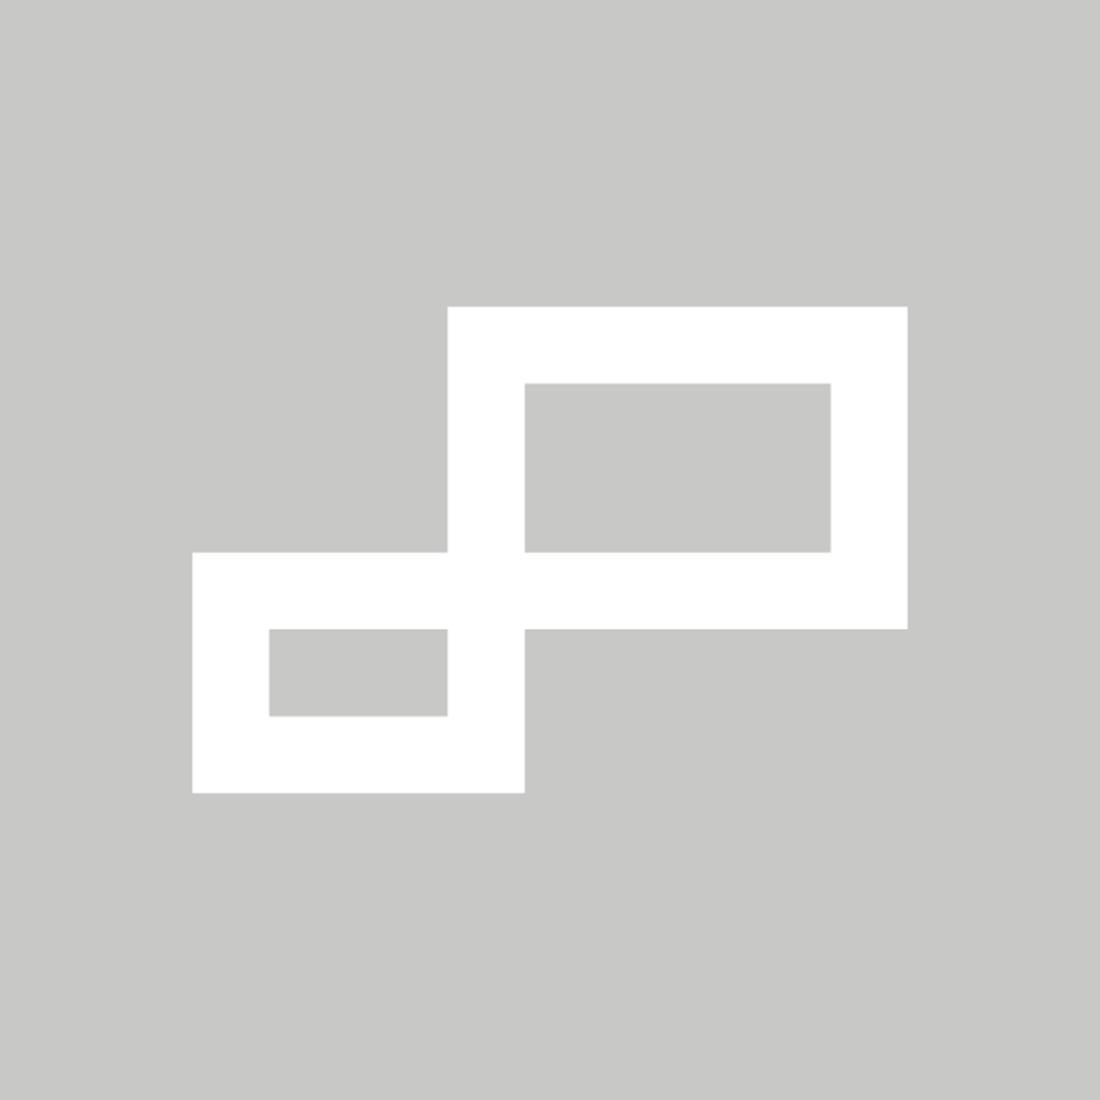 "4"" x 3"" Standard Event Badge"